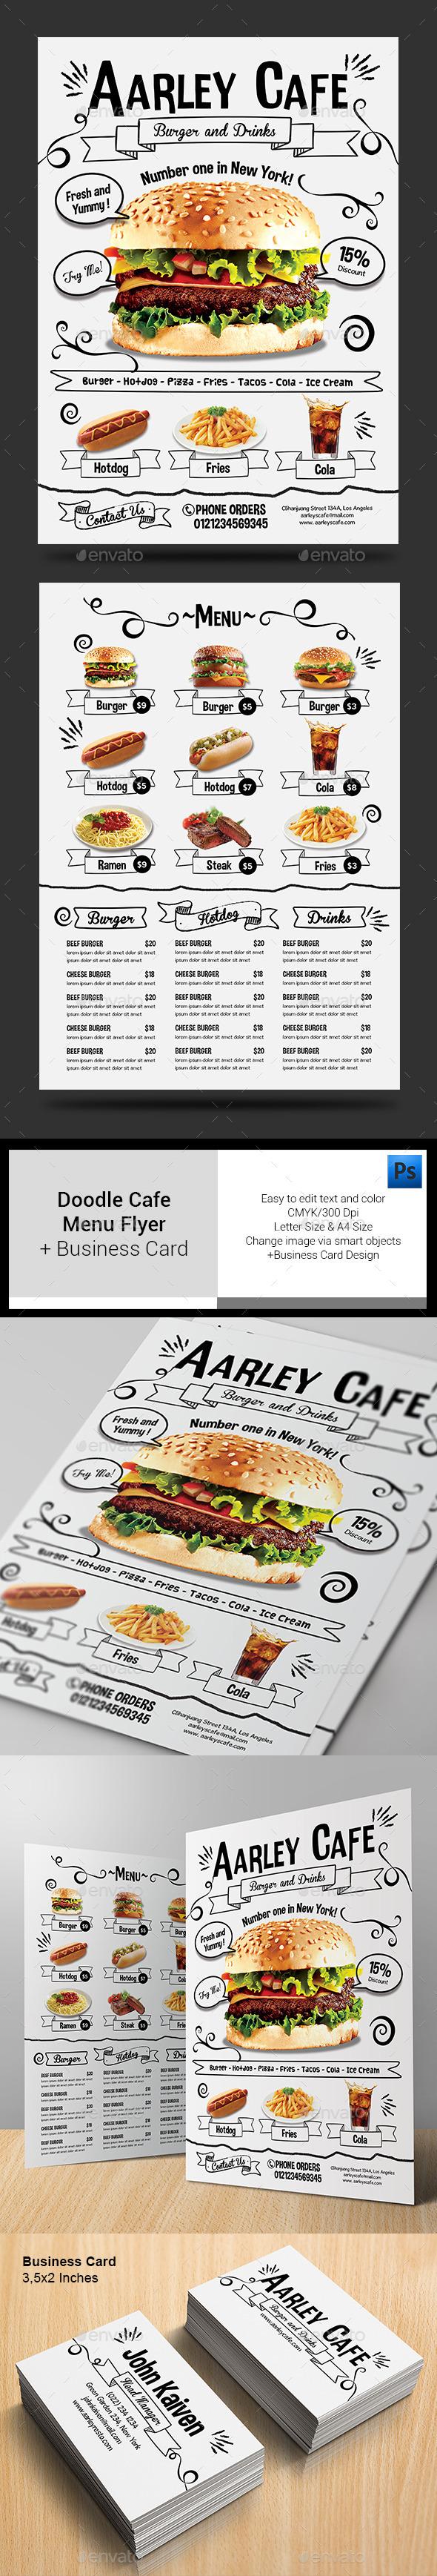 Doodle Cafe Menu & Business Card